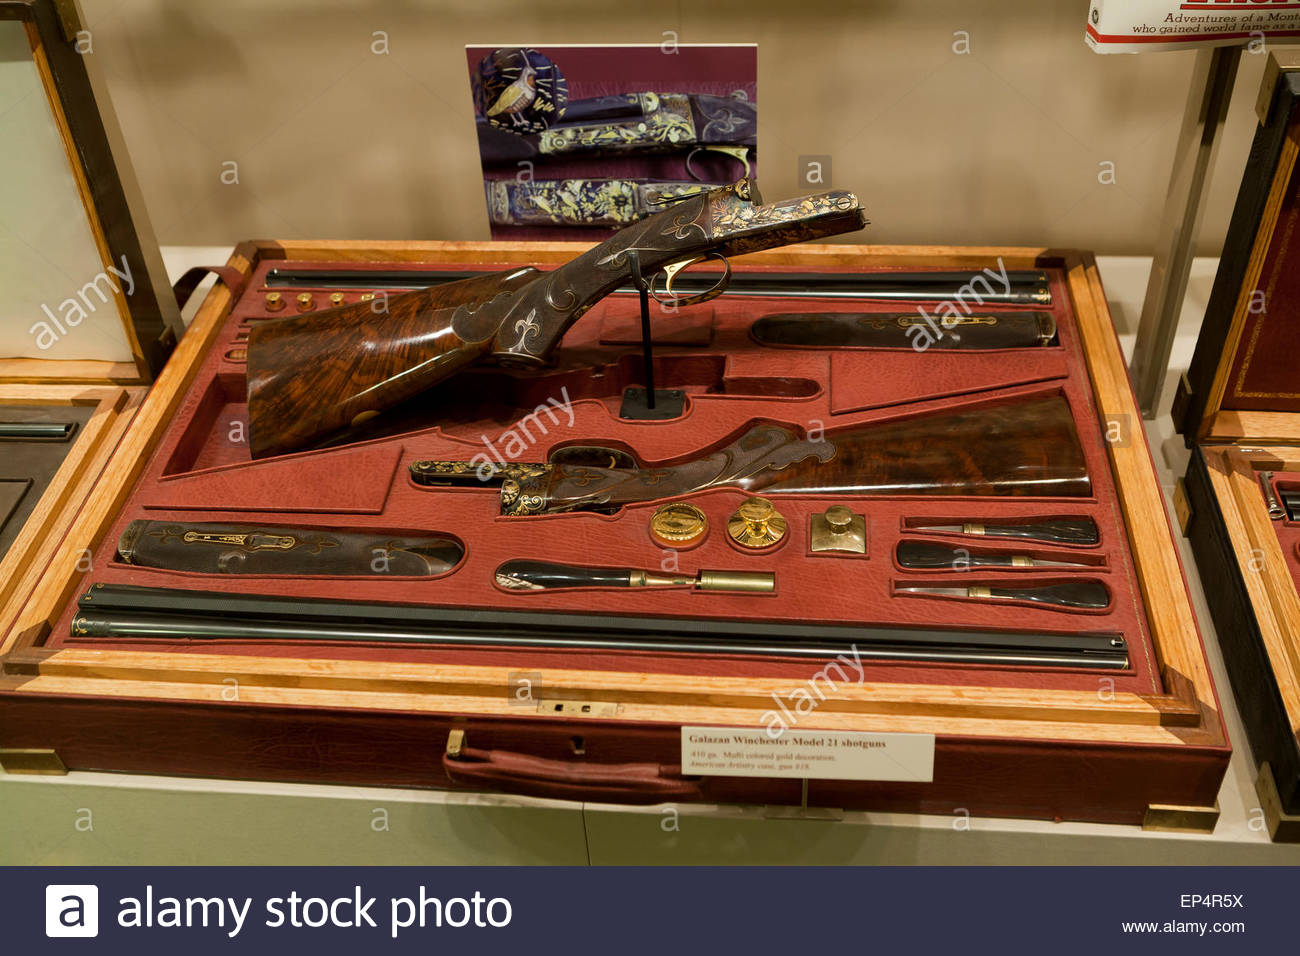 Galazan Winchester Model  Shotguns In Case At National Firearms - Gun museums in usa